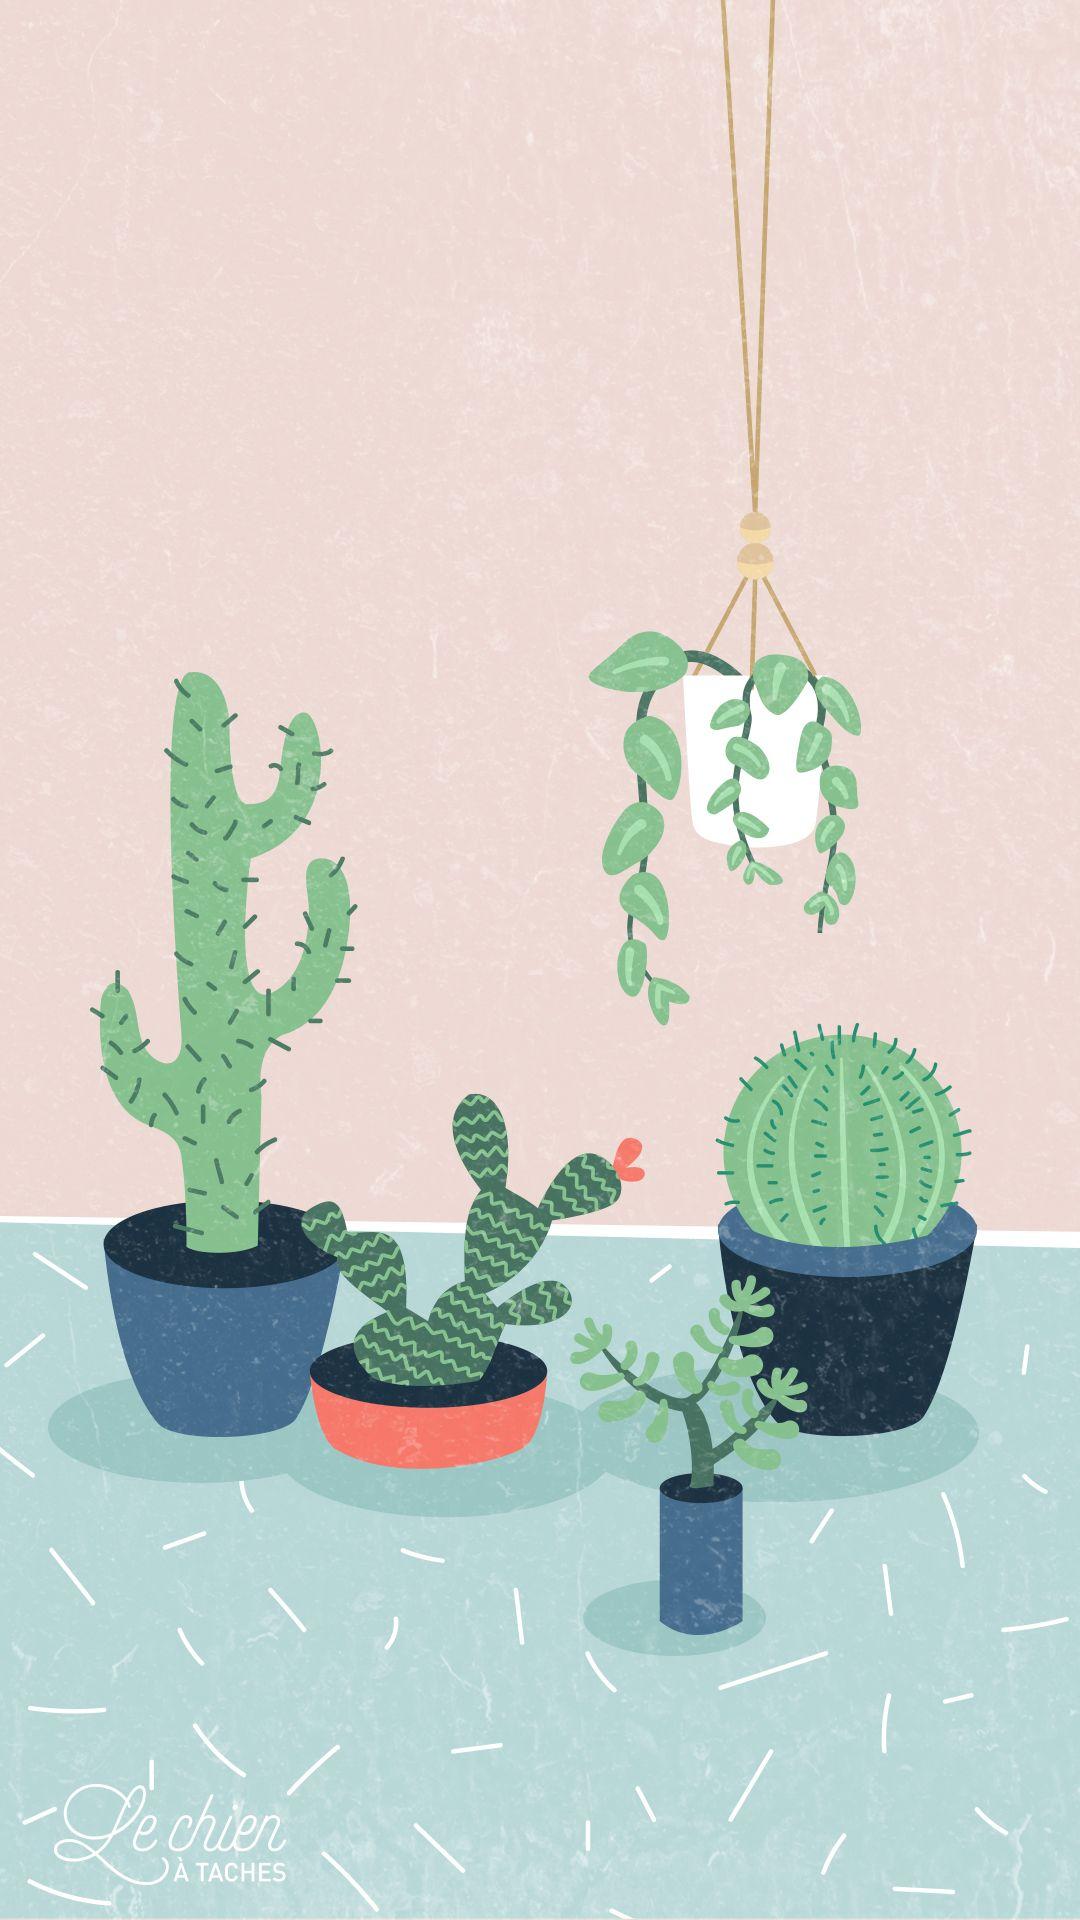 Cactus Girl Pastel Iphone Lock Wallpaper At Panpins Iphone